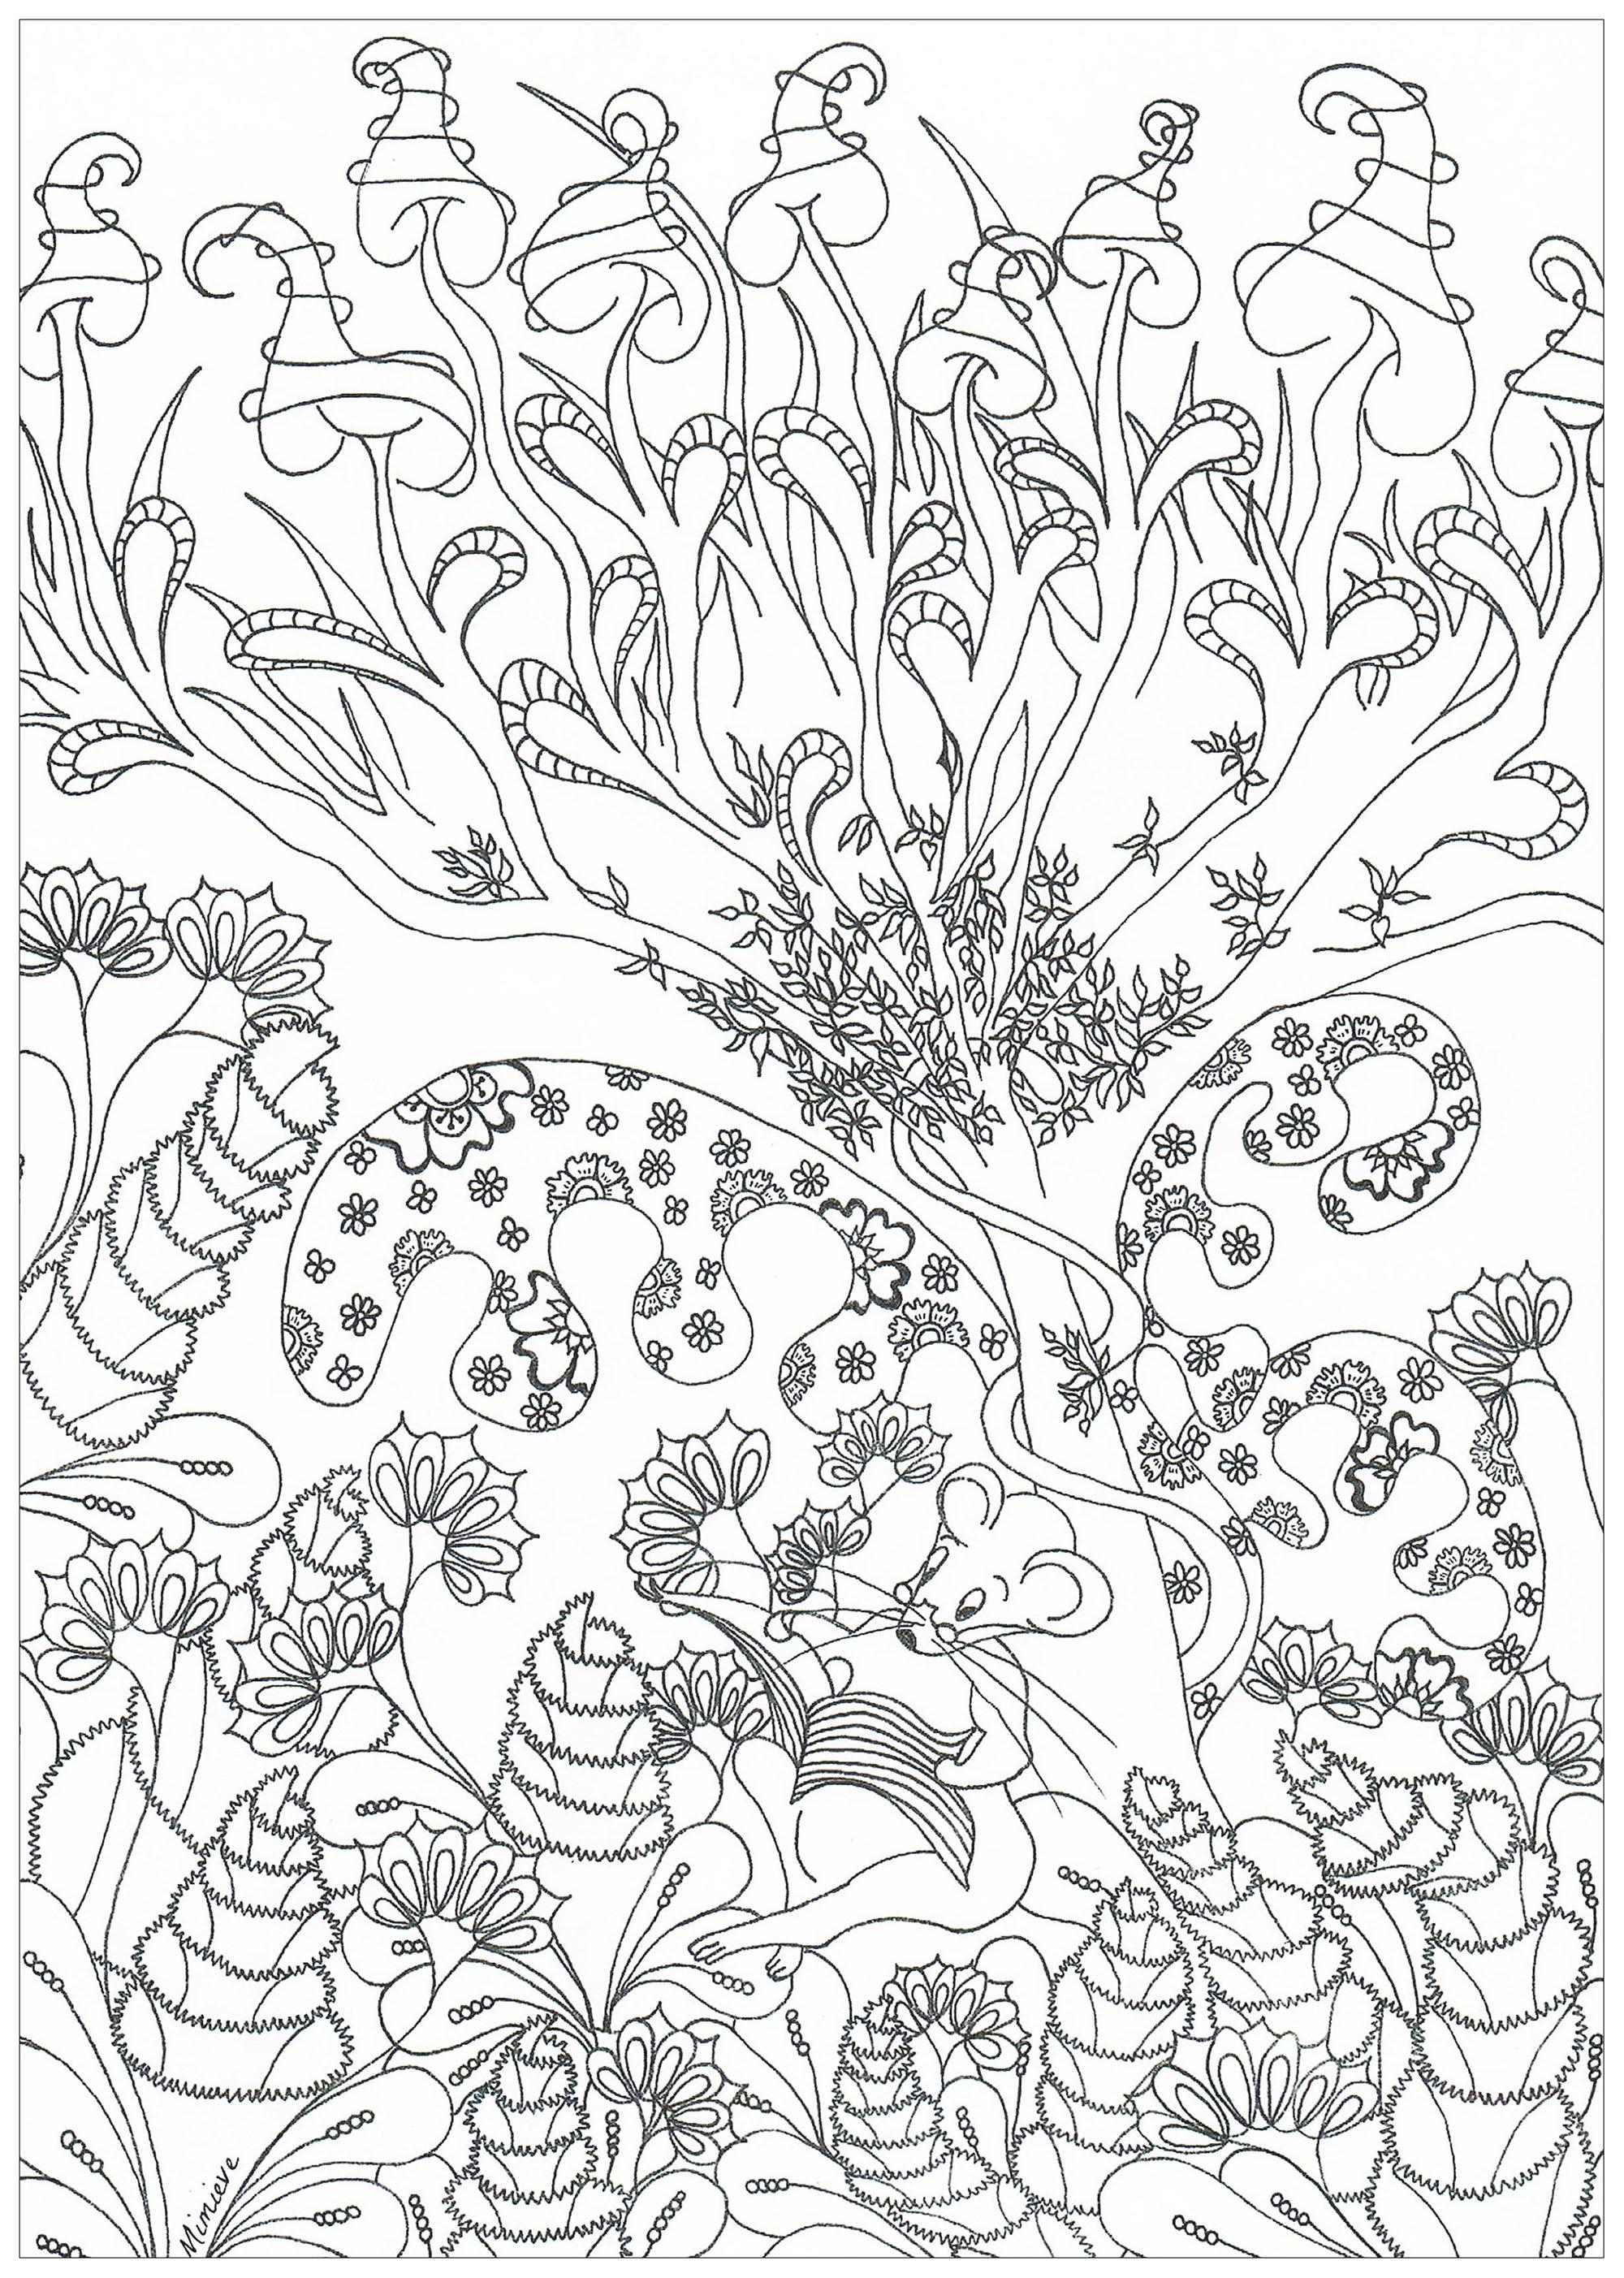 Dschungel Wald 43041 Dschungel Wald Malbuch Fur Erwachsene